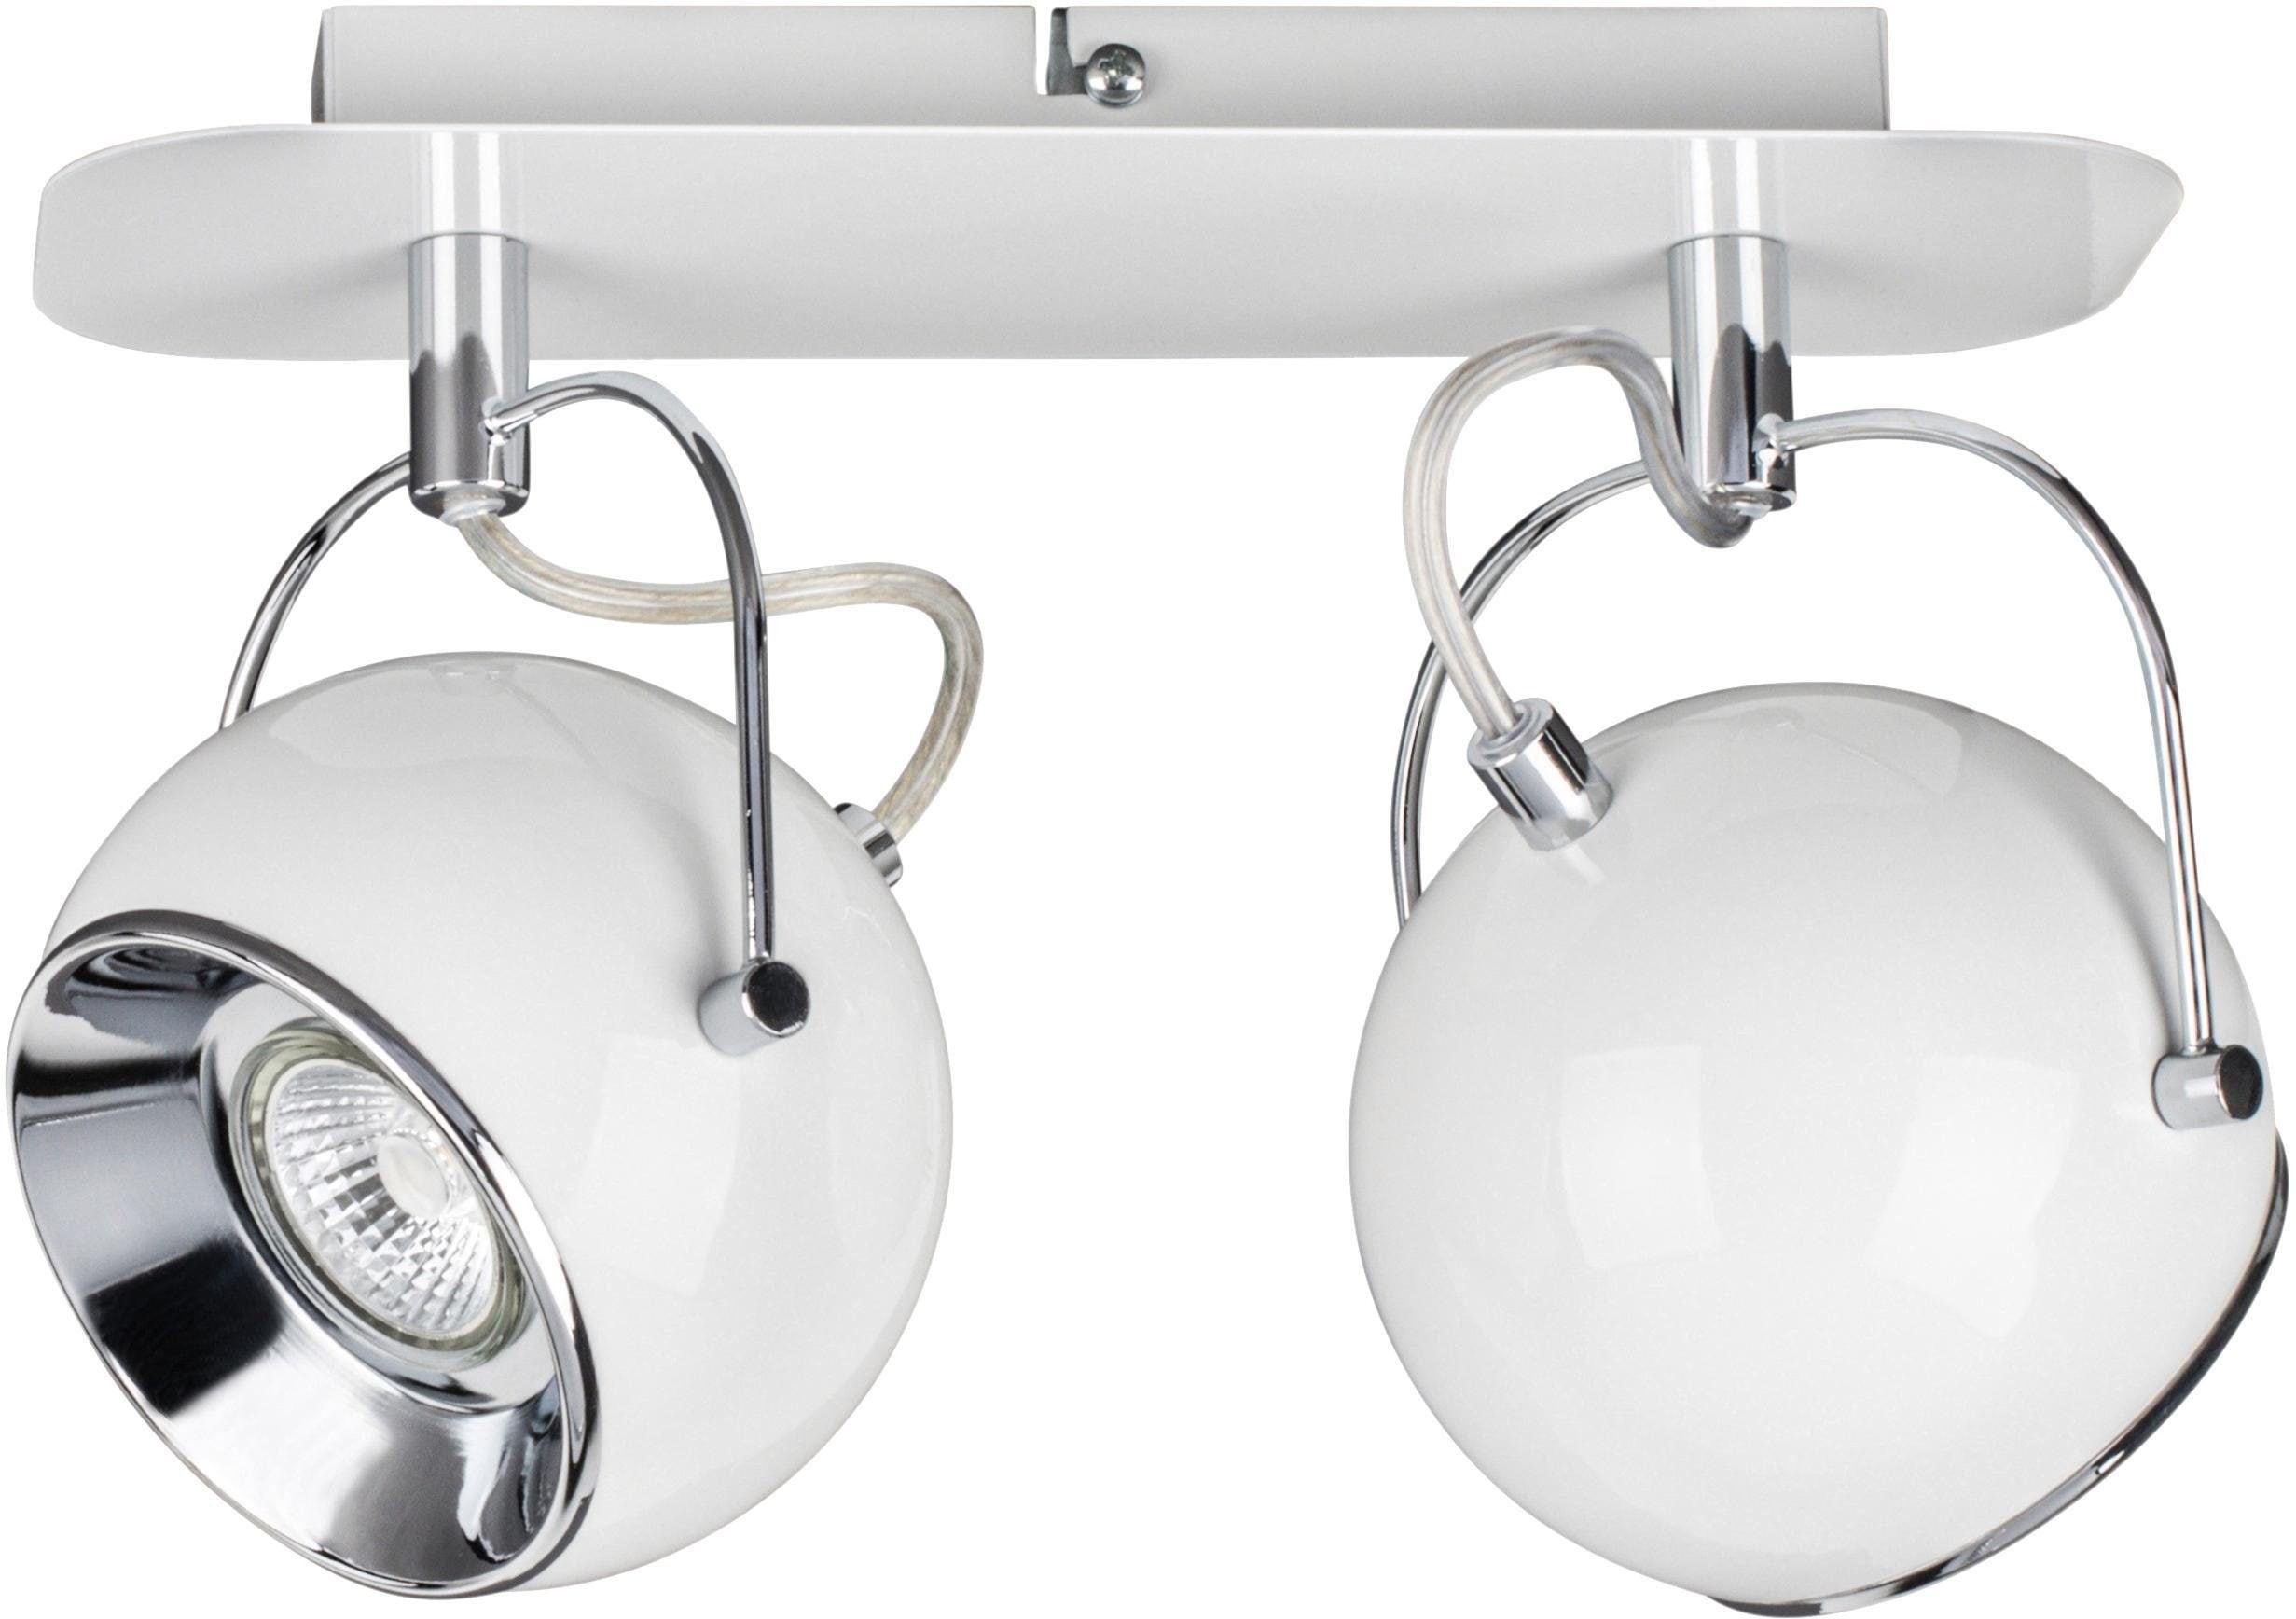 SPOT Light Deckenleuchte BALL, GU10, Warmweiß, Inklusive LED-Leuchtmittel, Schwenkbare und flexible Spots, Made in EU